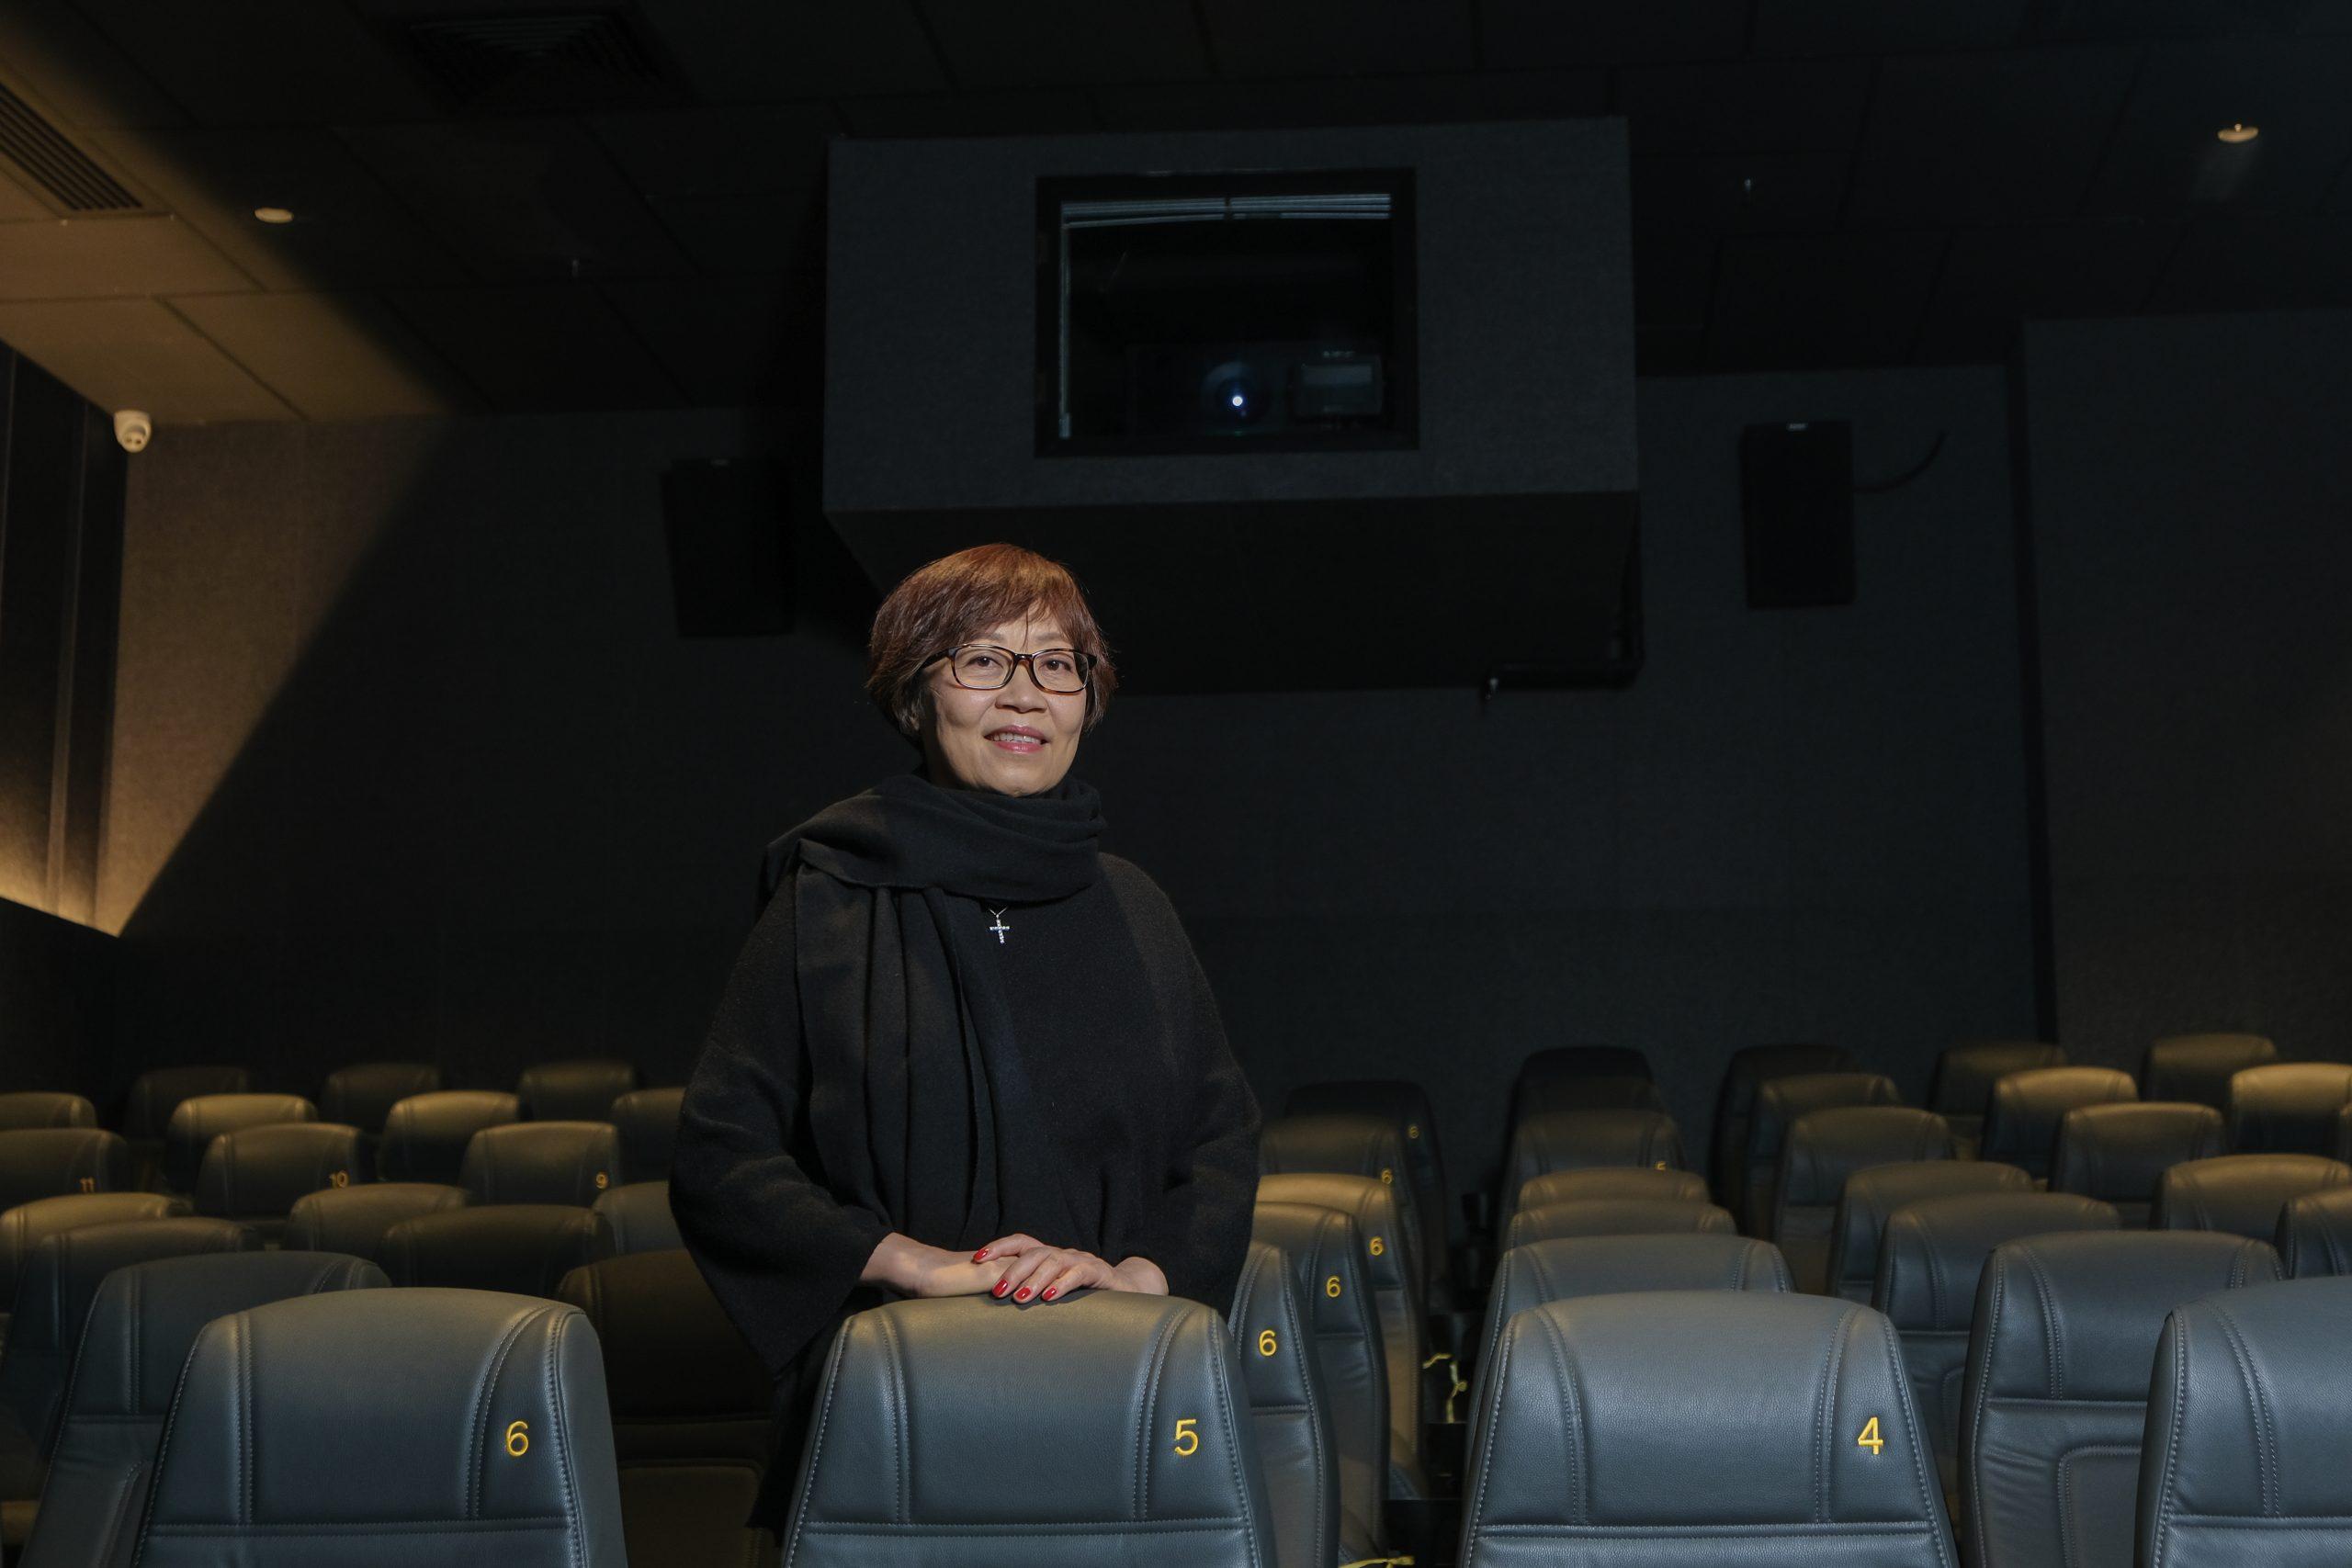 Golden Scene 高先電影院 曾麗芬 堅尼地城 戲院 狂舞派3